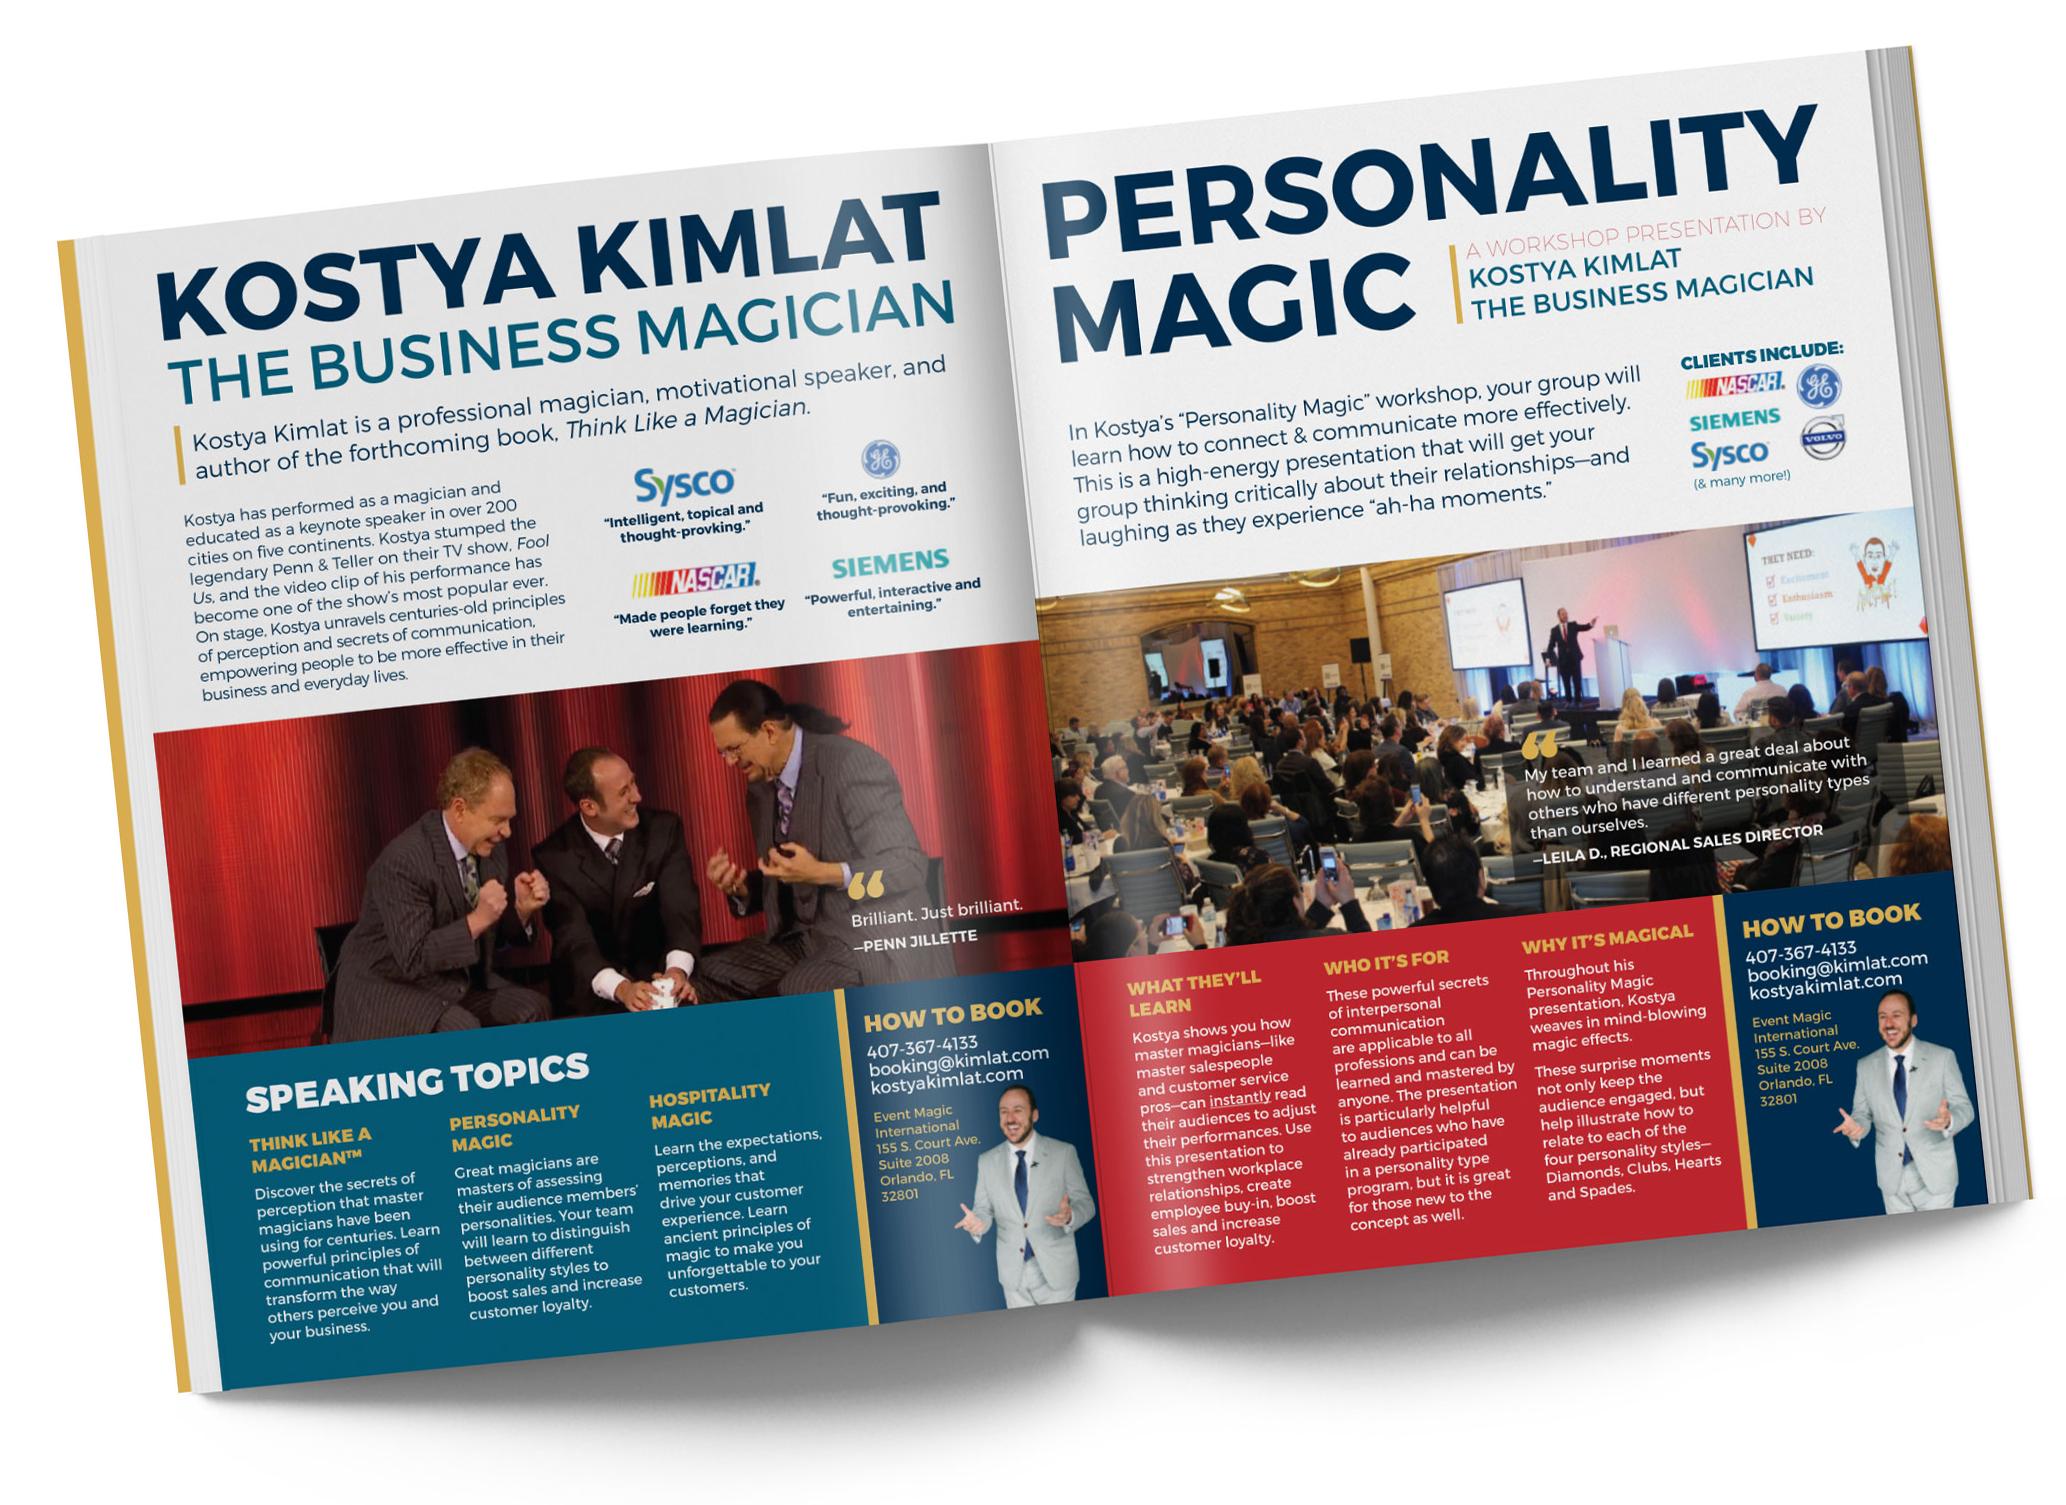 Orlando-motivational-speakers-Kostya-Kimlat-Personality-Magic-Speaking-Kit.jpg